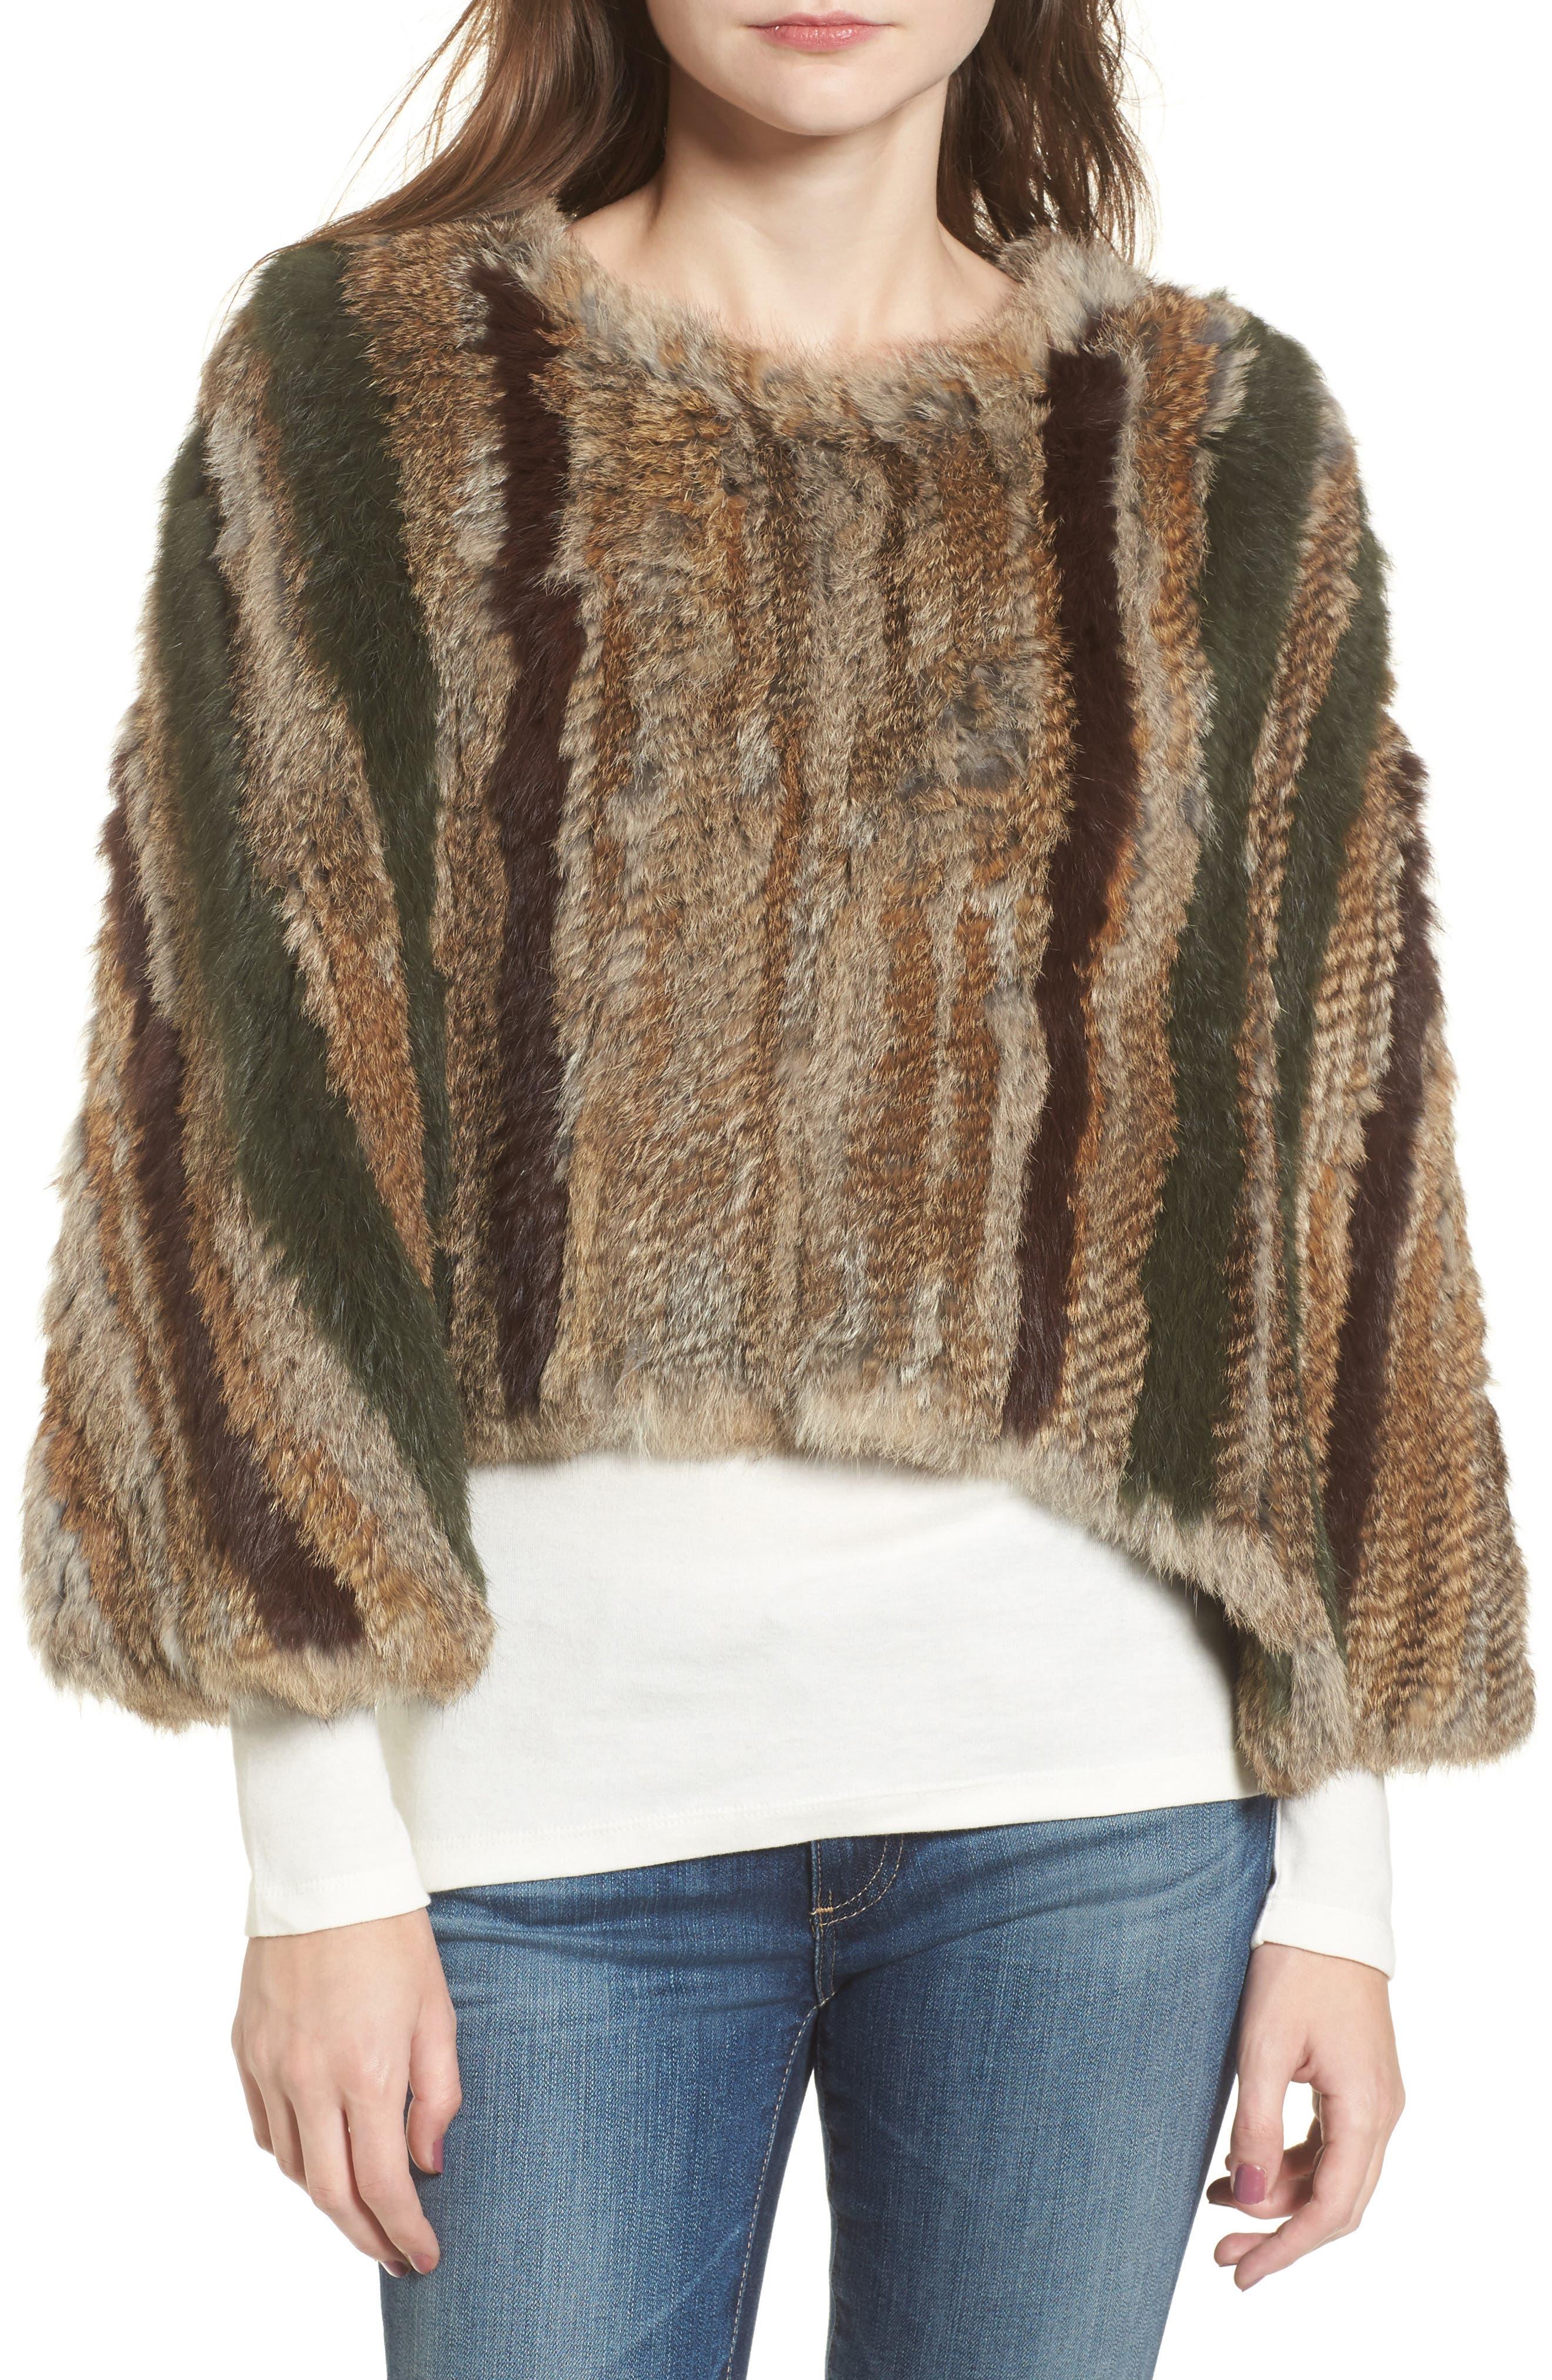 BNCI Nomad Genuine Rabbit Fur Pullover,                             Main thumbnail 1, color,                             208